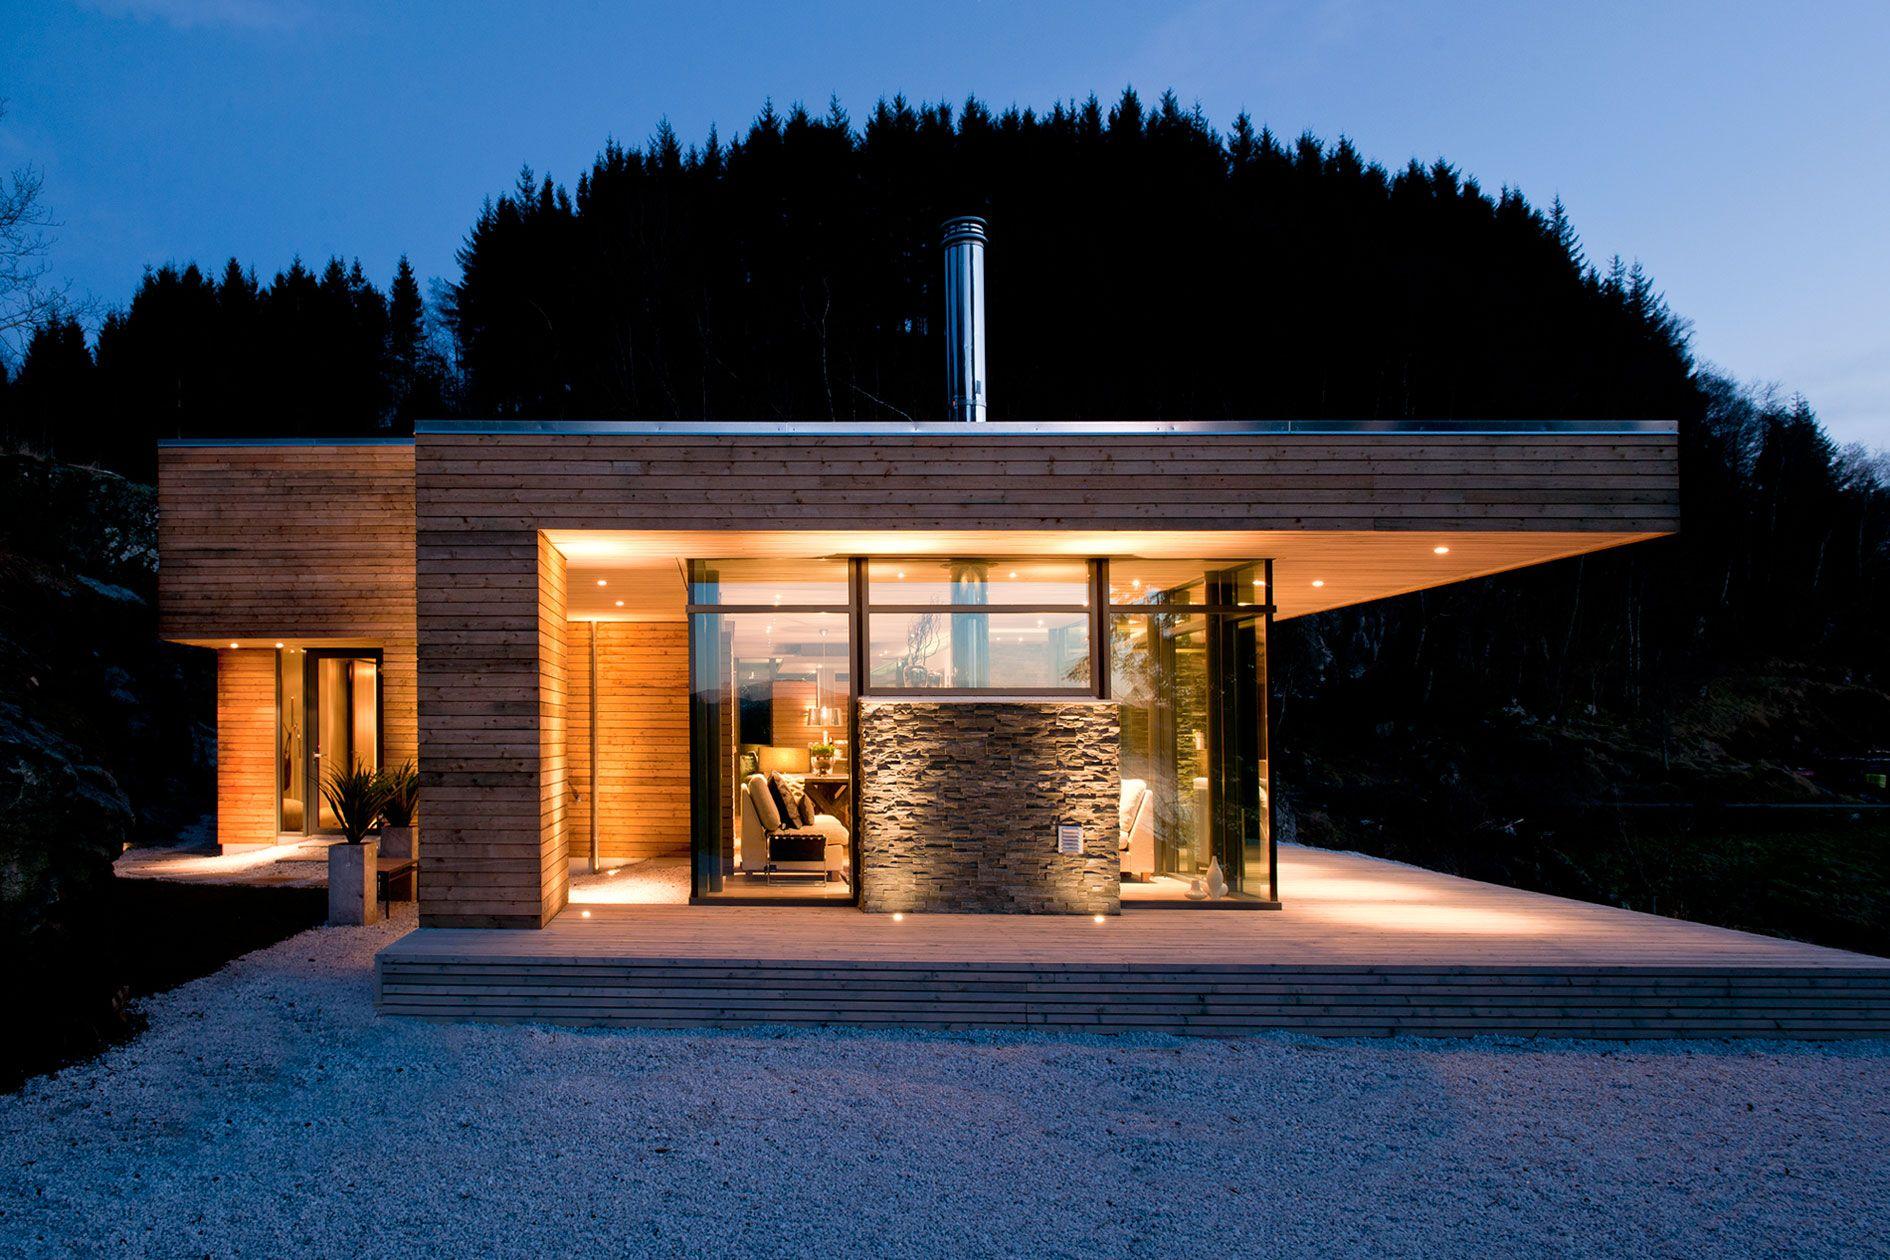 Minimalist Cabin exterior modern lake house architecture riverview gardens facade